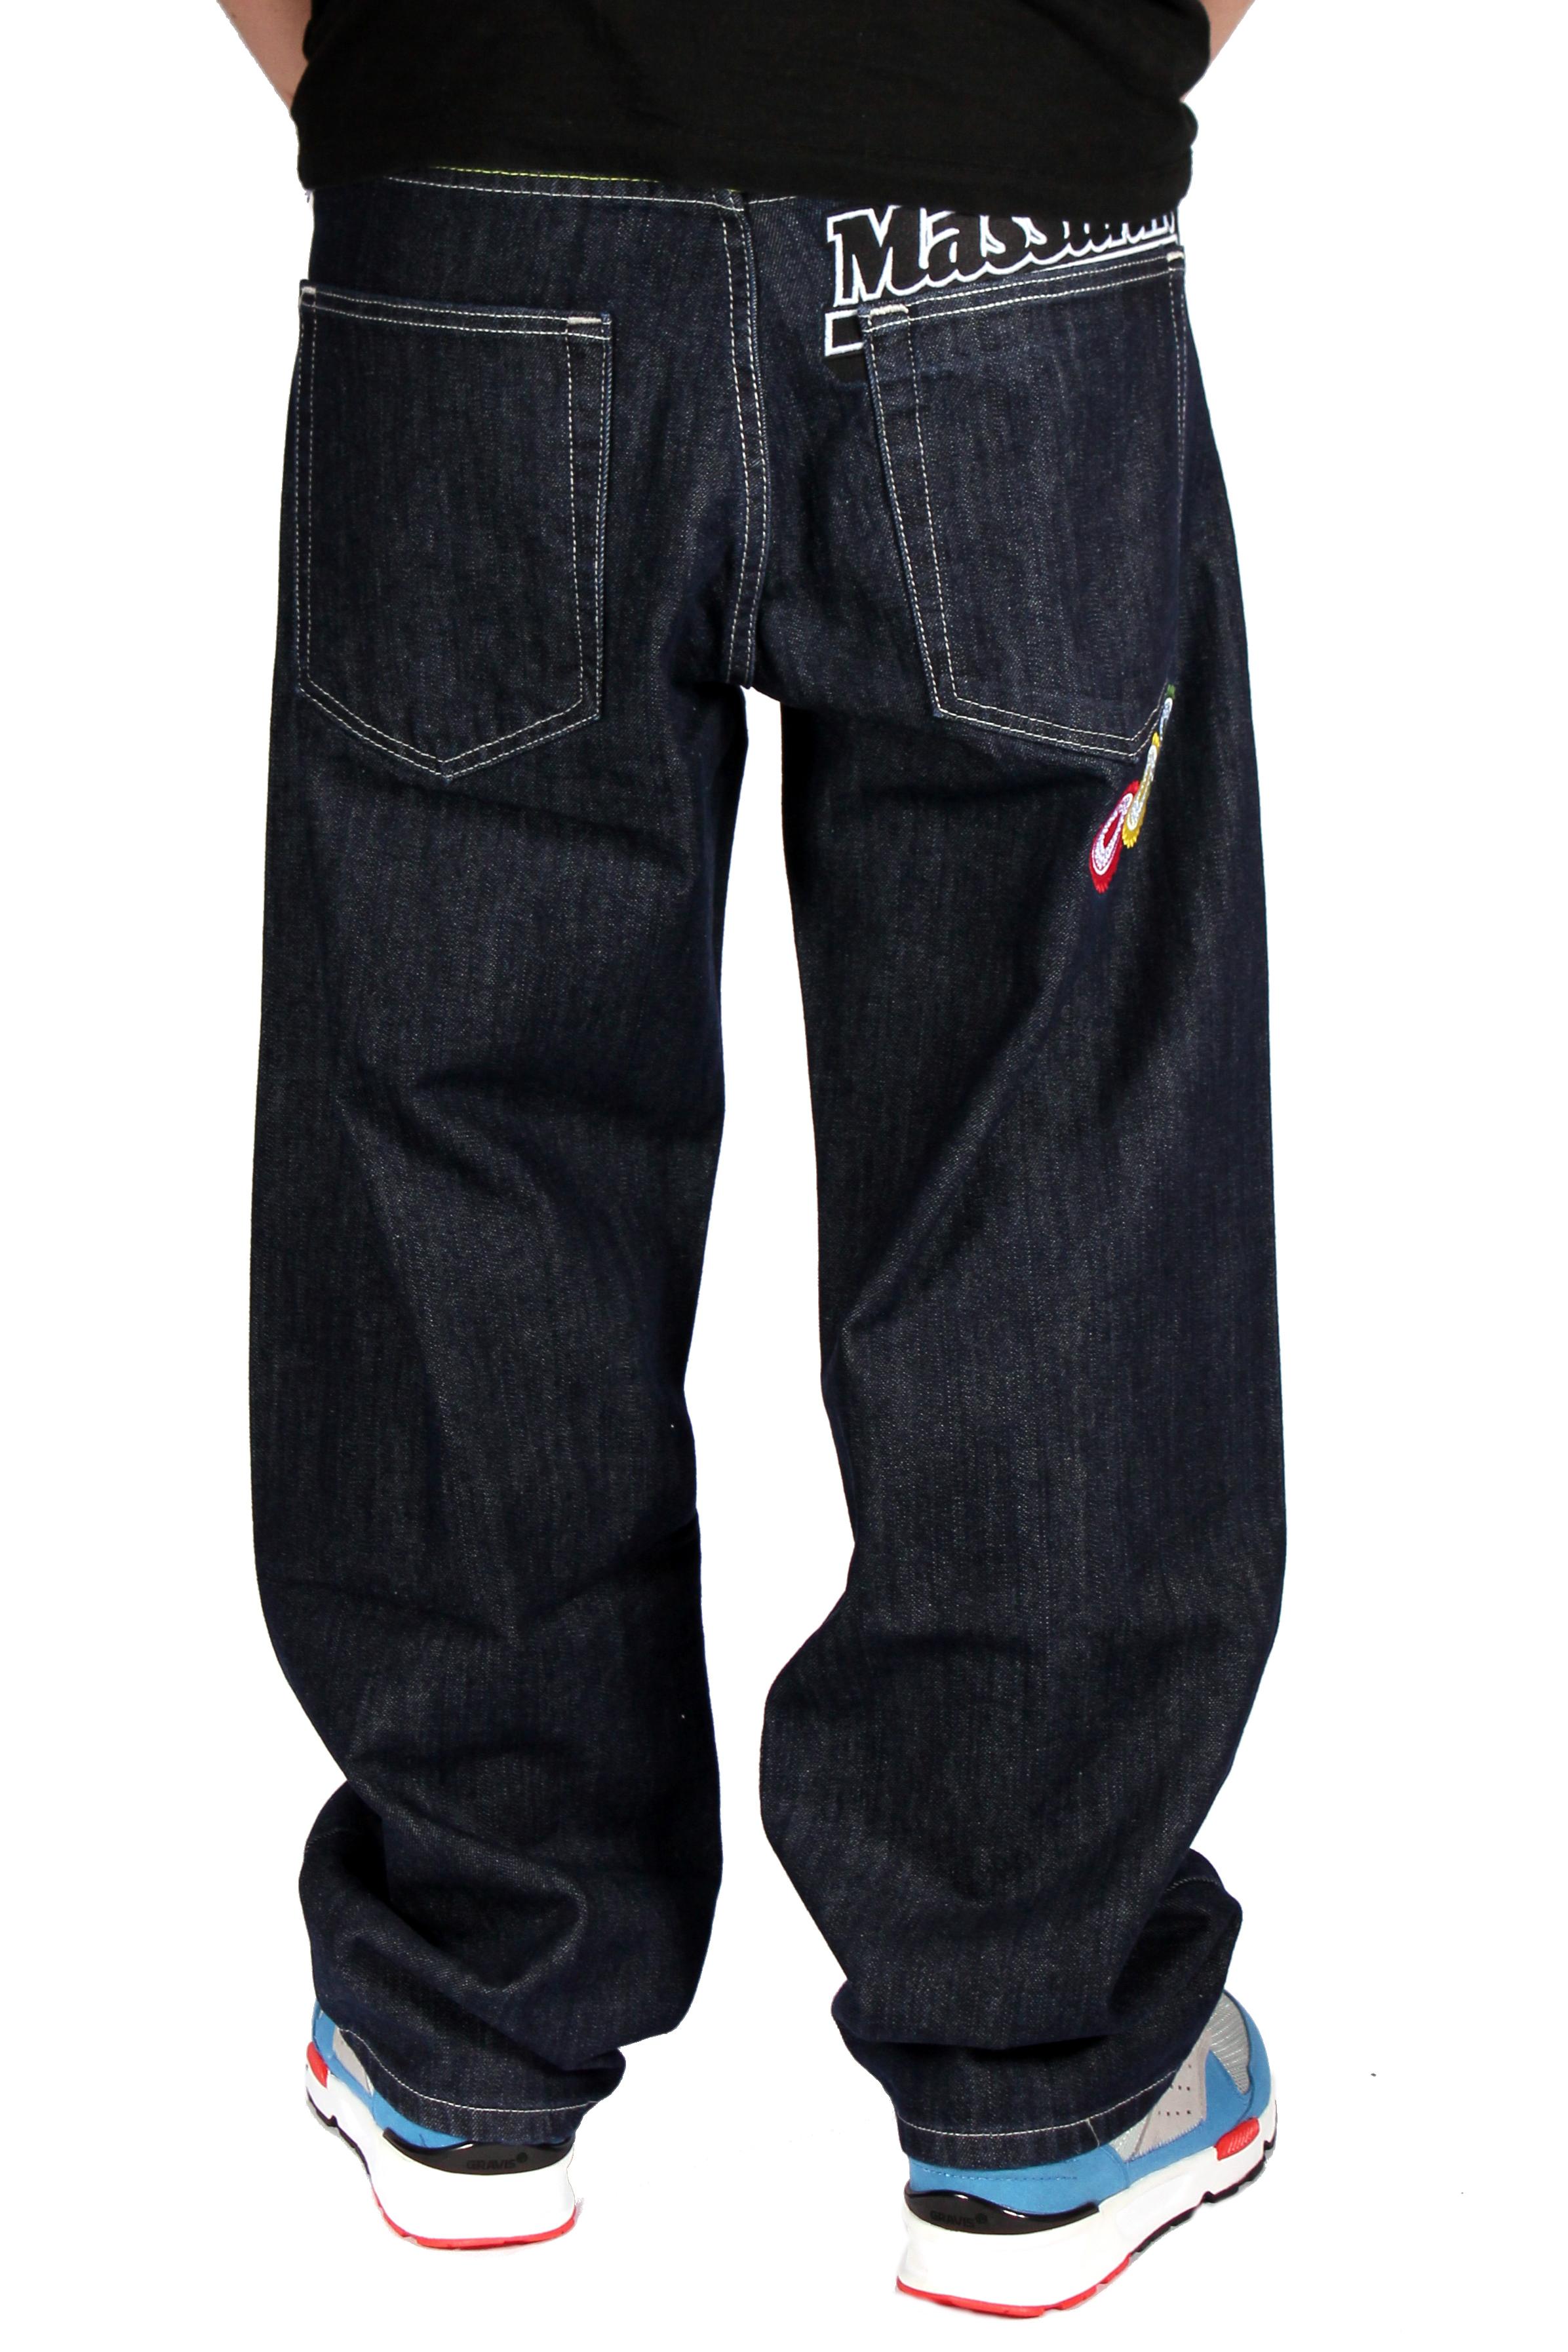 Spodnie Mass Denim Jeans Fiesta Baggy (Rinse)